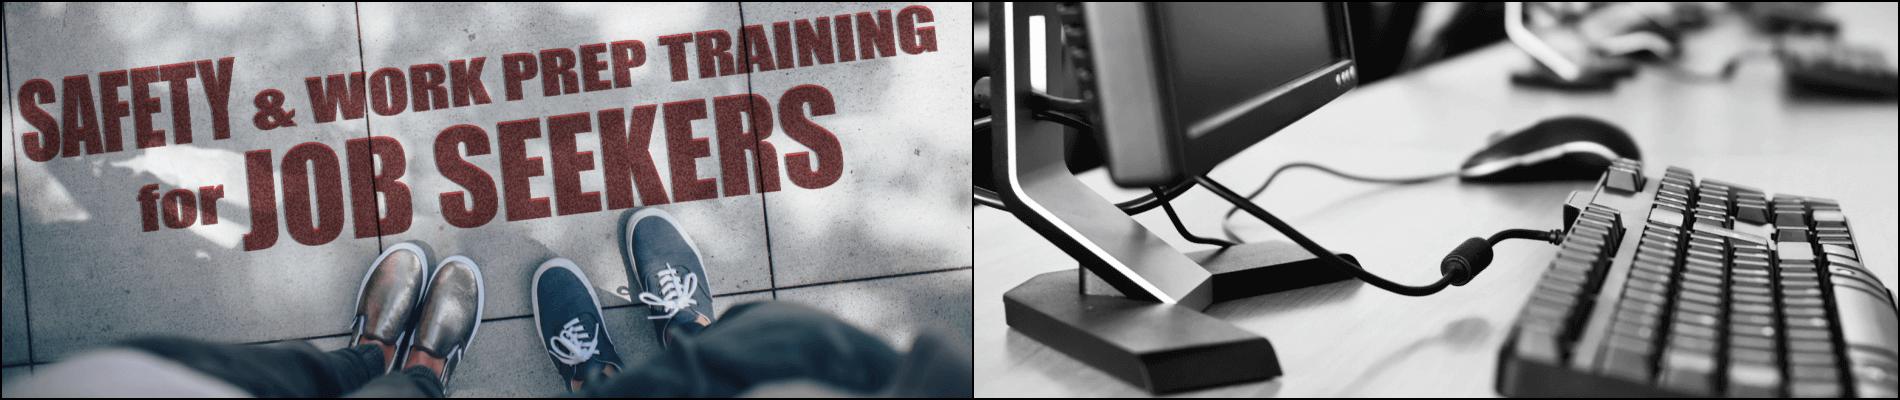 Job Seeker Training